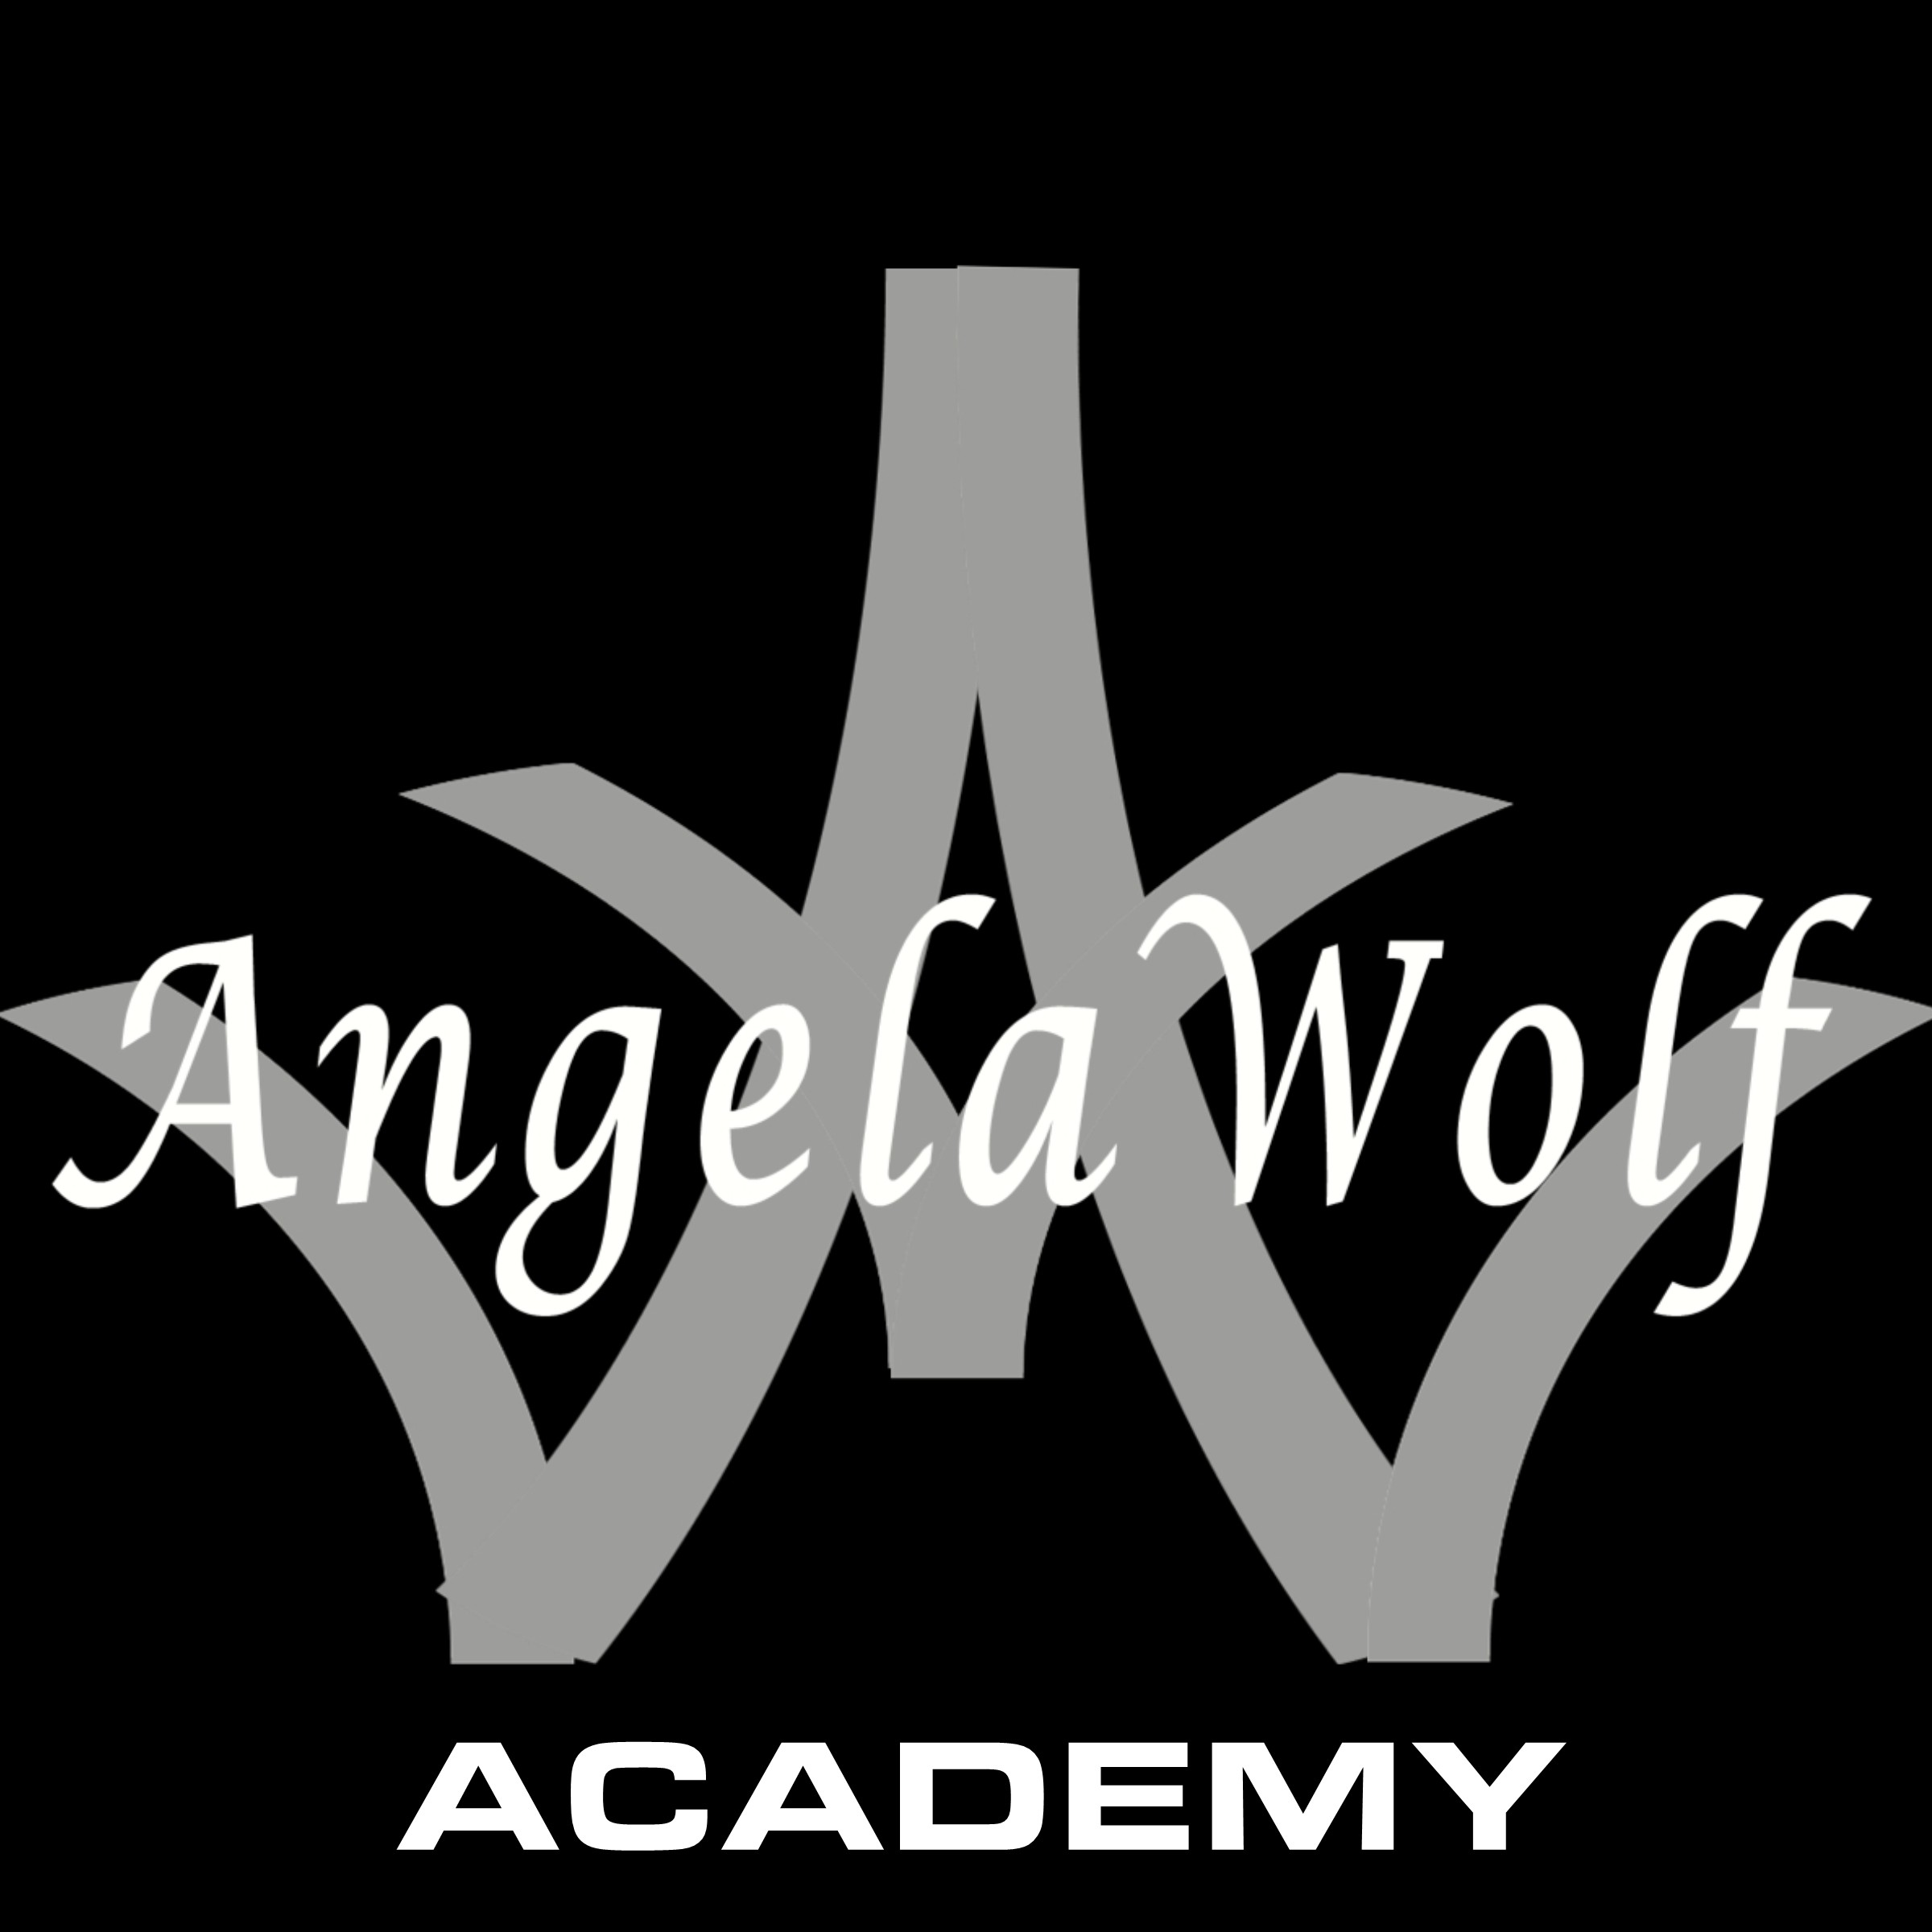 Angela Wolf Academy